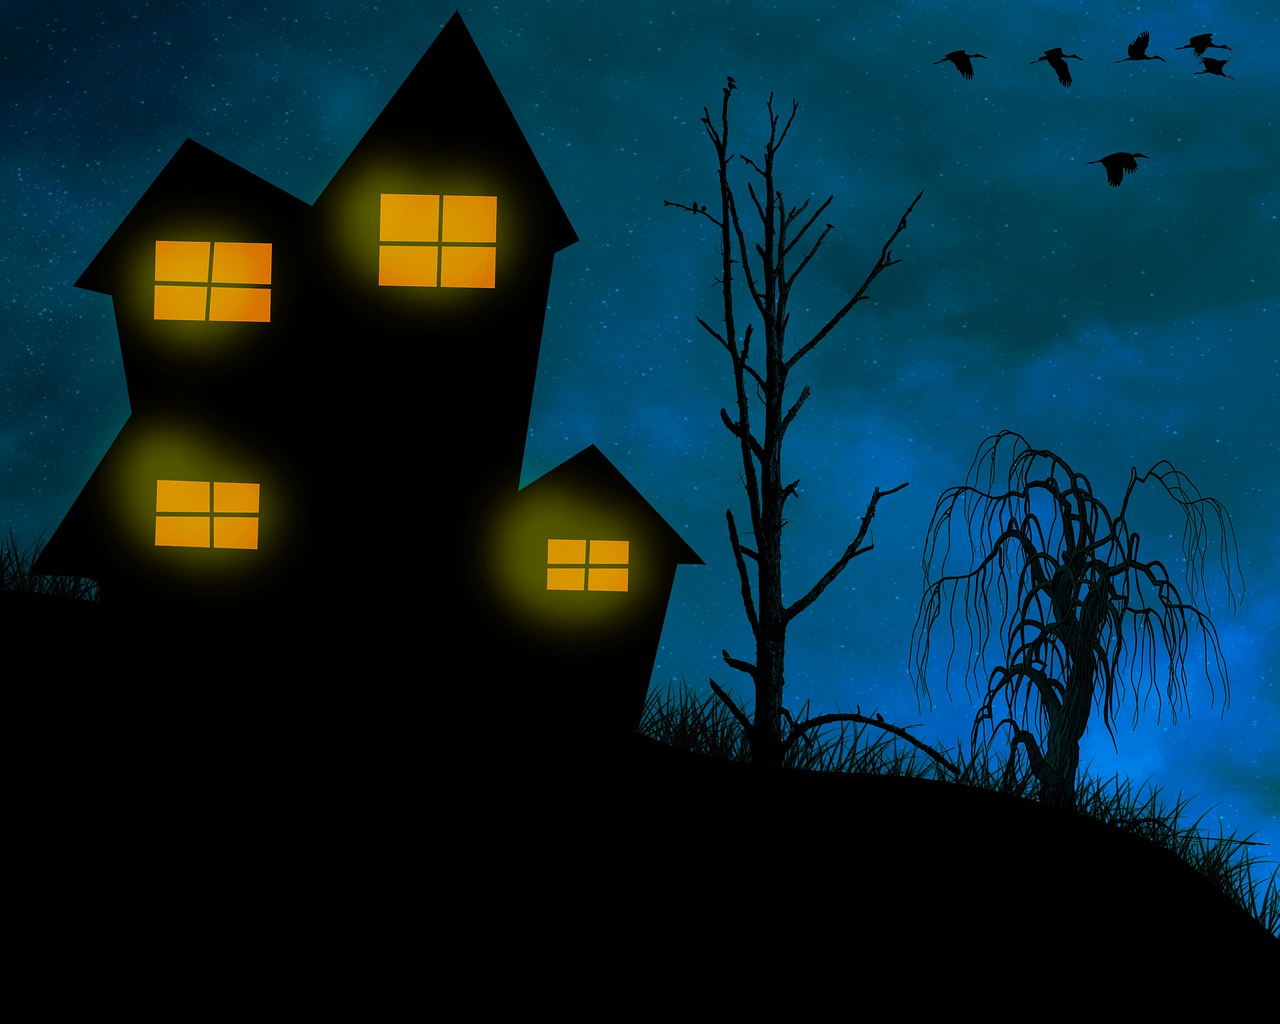 домики ночью картинки архитектурном плане она